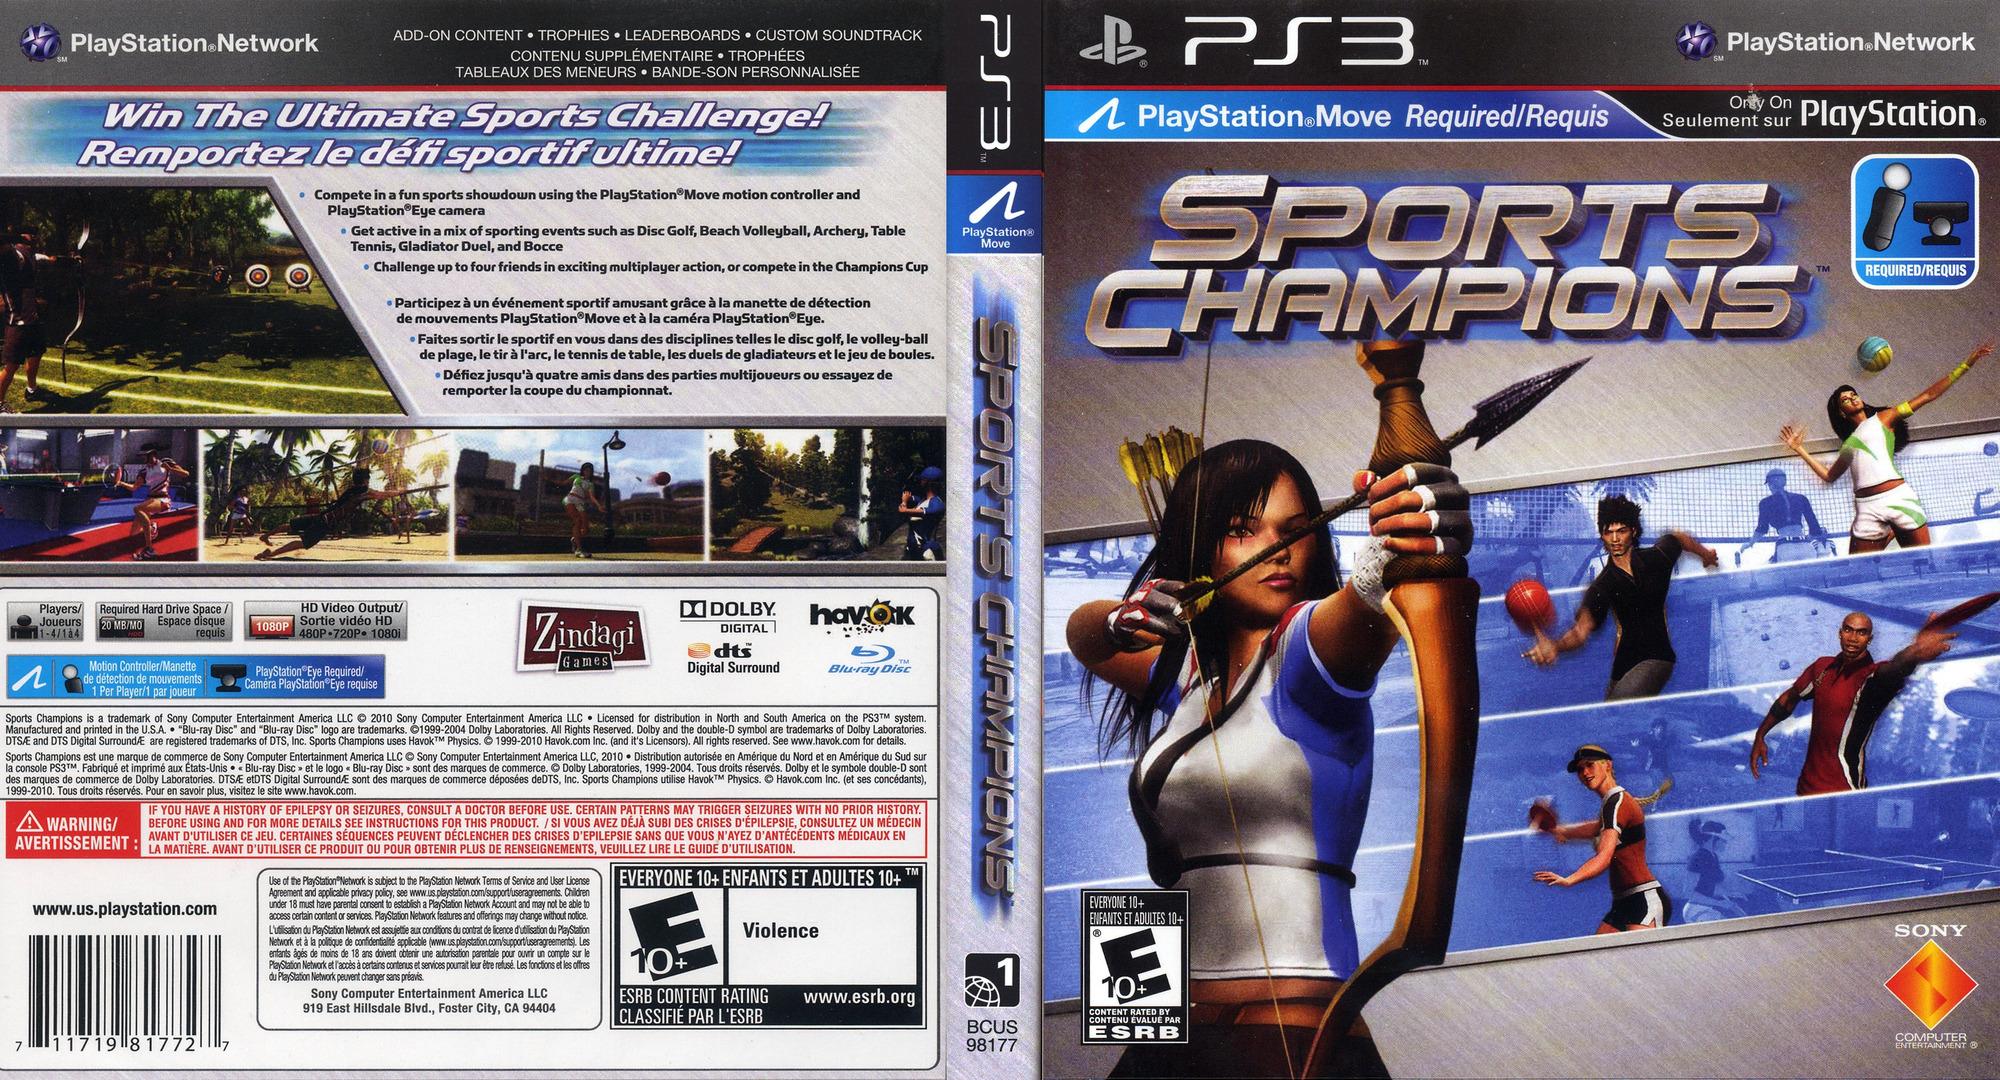 Sports Champions PS3 coverfullHQ (BCUS98177)